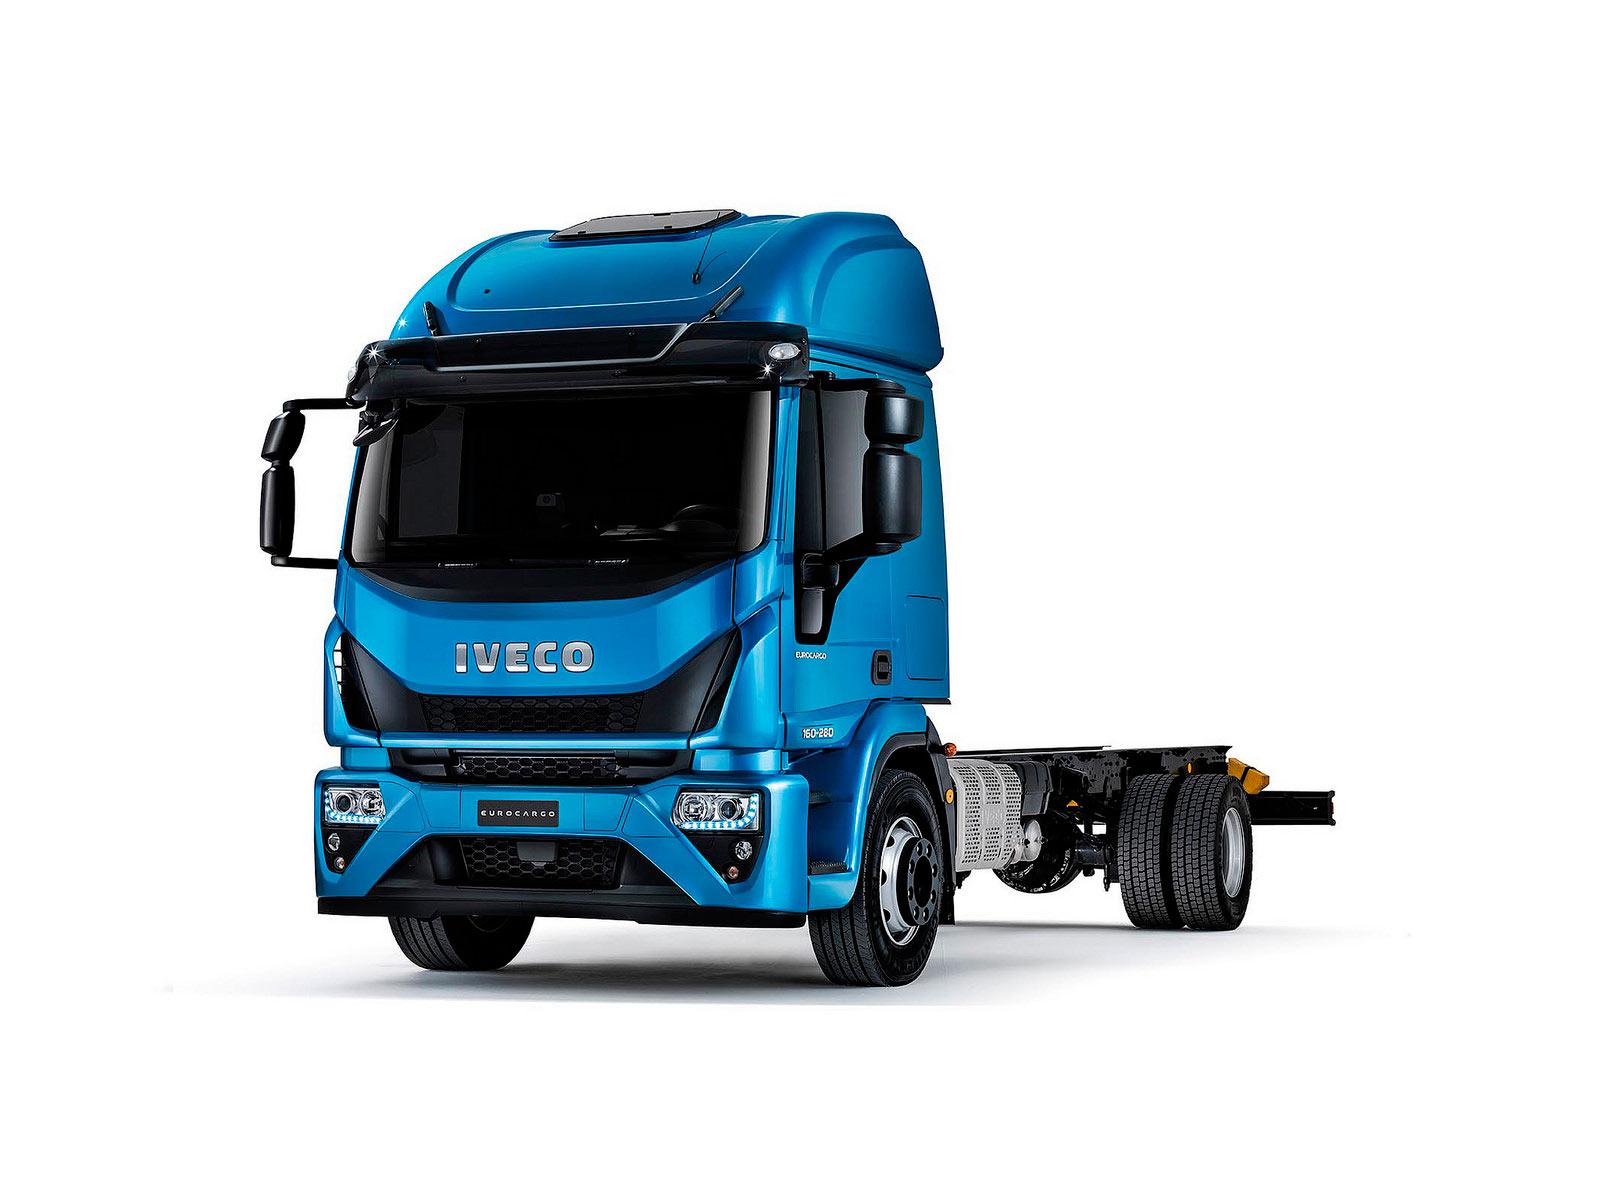 2016 manual transmission trucks autos post. Black Bedroom Furniture Sets. Home Design Ideas